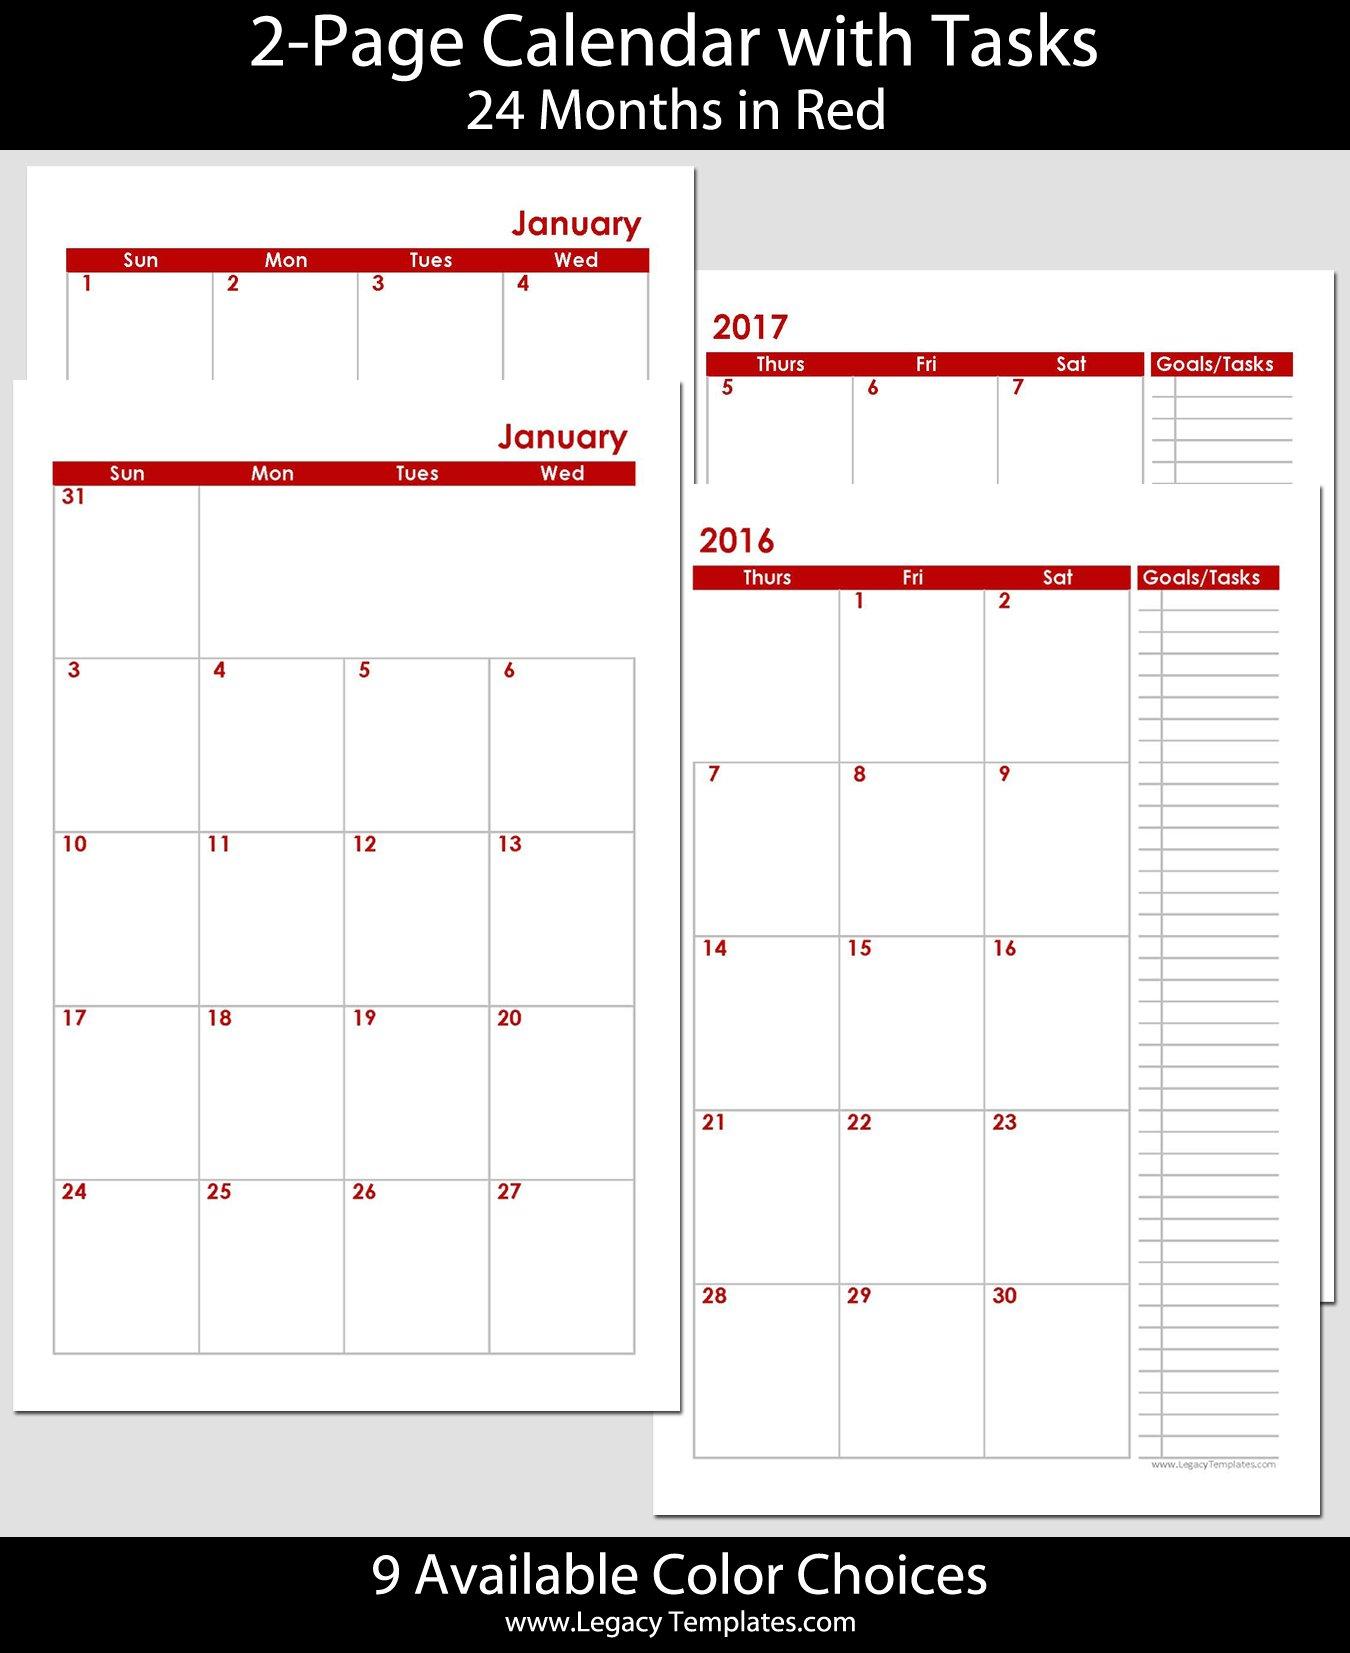 2016 & 2017 - 24-Months 2-Page Calendar - Half Size Monthly Calendar On 8 X 11 Sheet